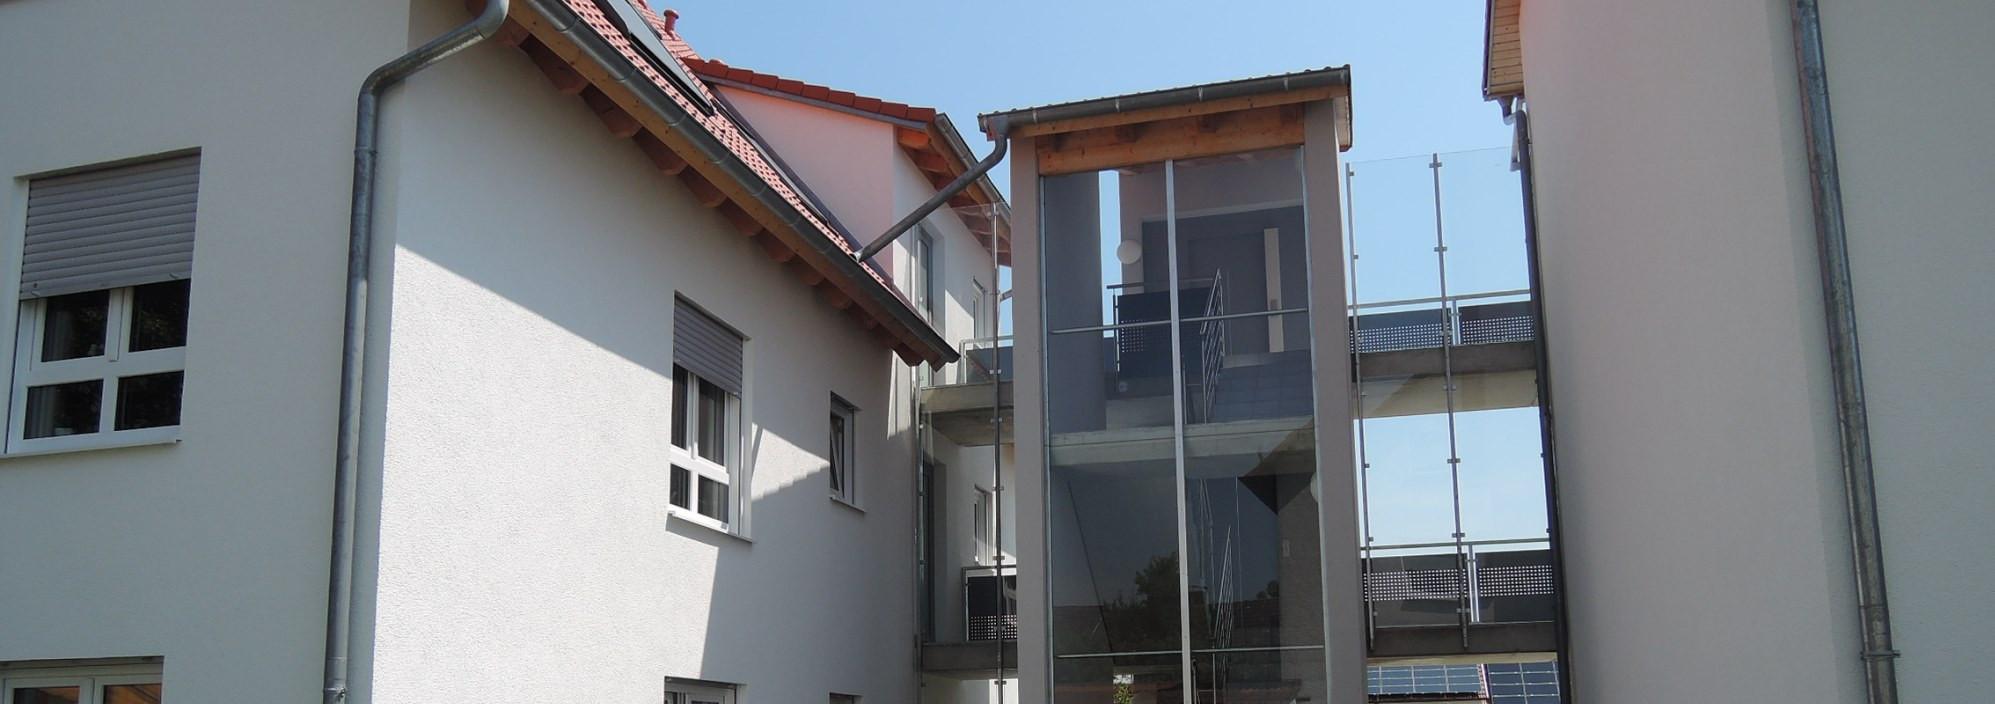 Wohnungen Ulm  Immobilien in Ulm Immobilien Ulm Immobilienmakler Haus